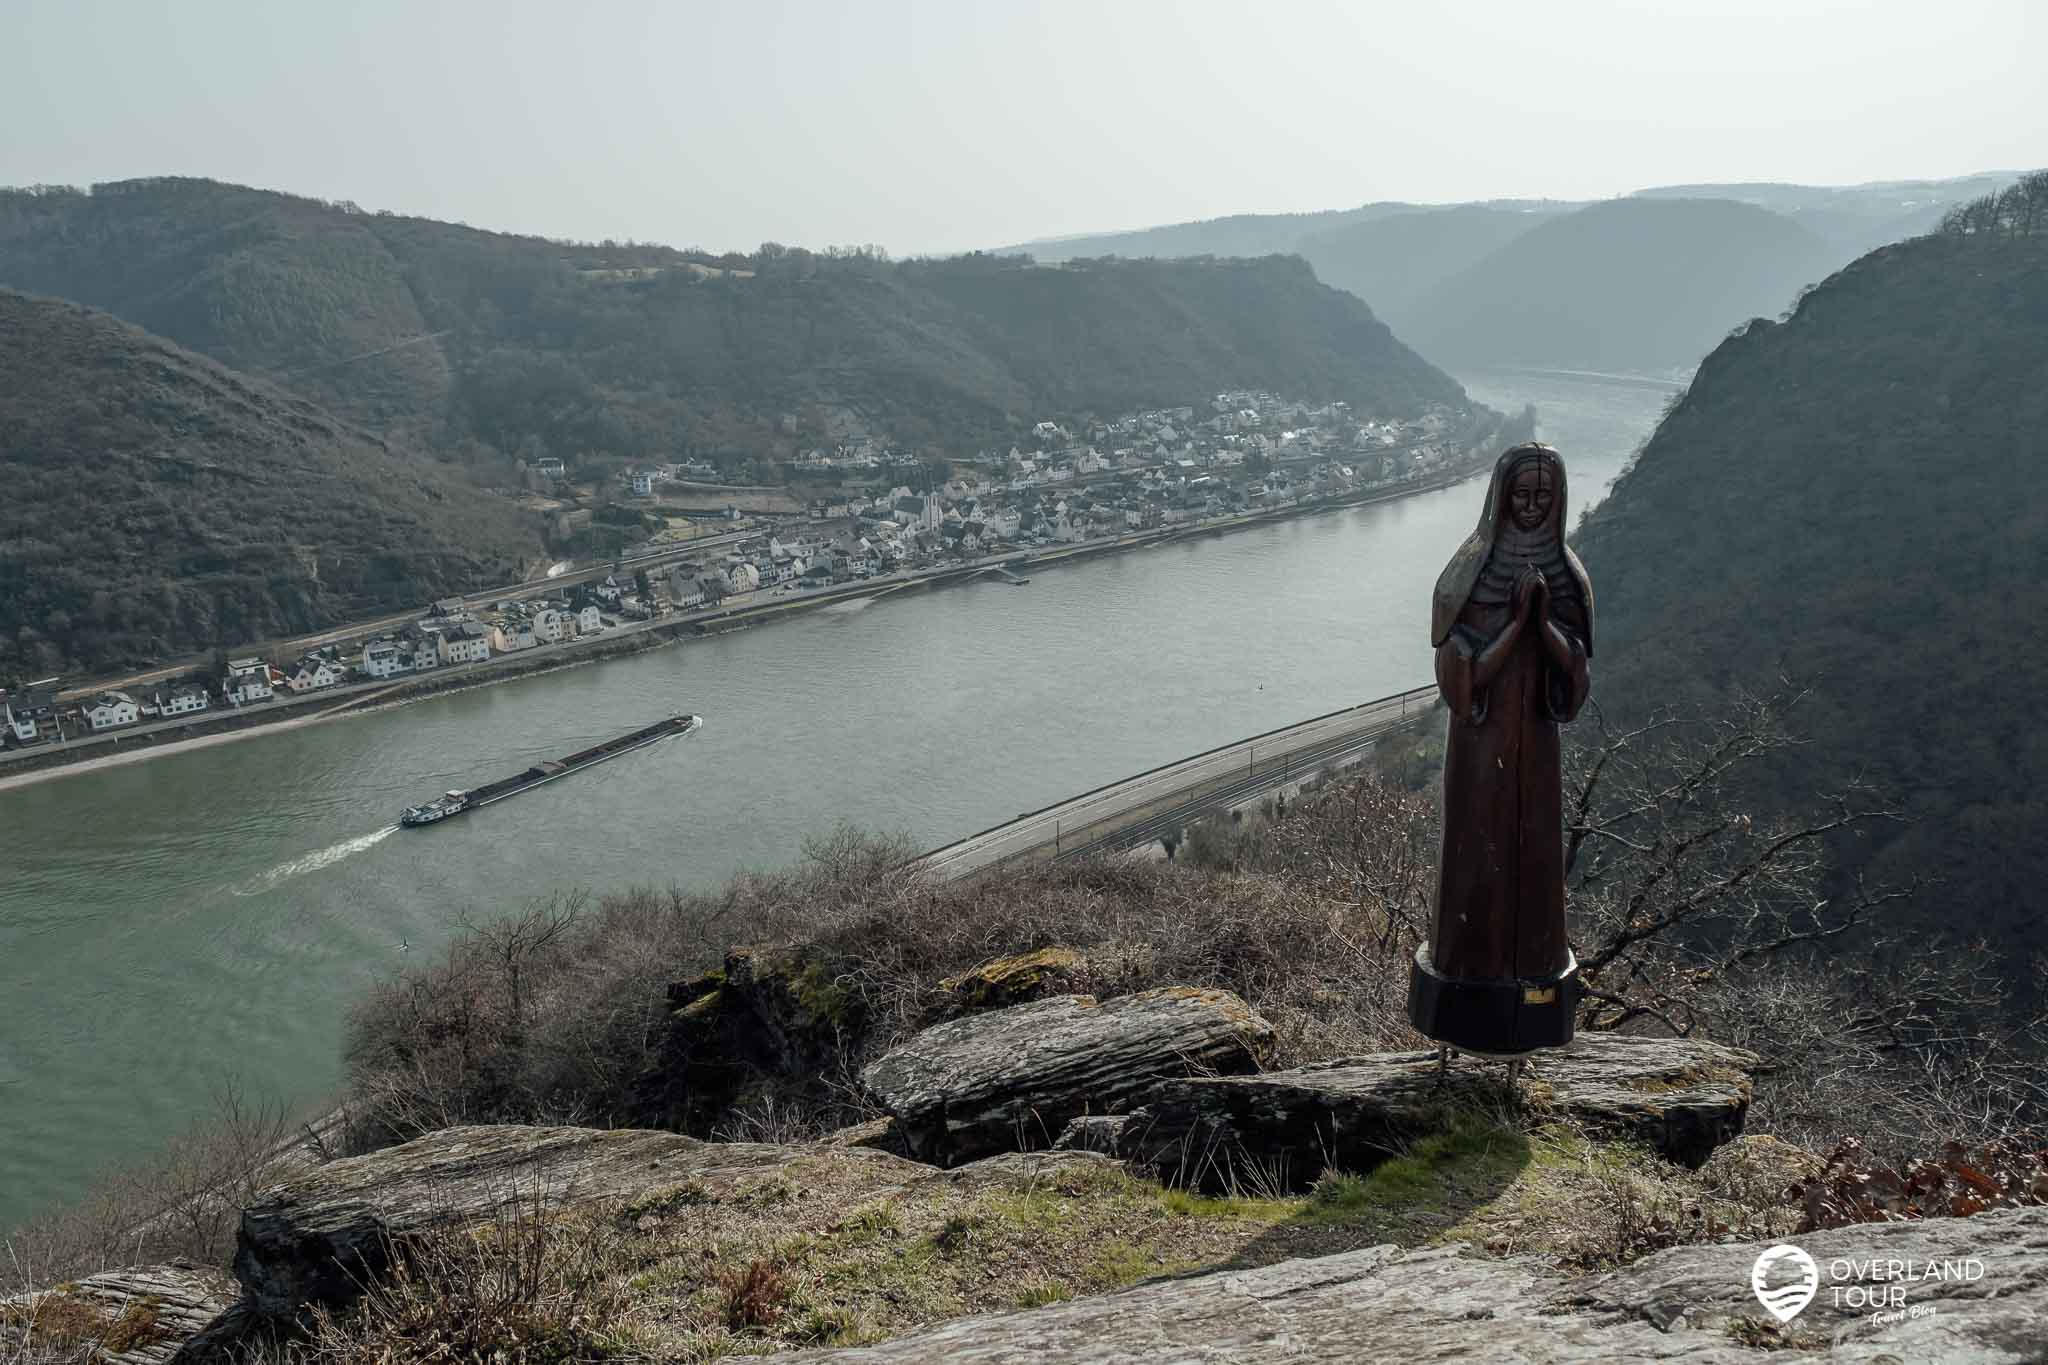 Wanderung Traumschleife Fünfseenblick: Der Aussichtspunkt Betende Nonne bei Kilometer 3